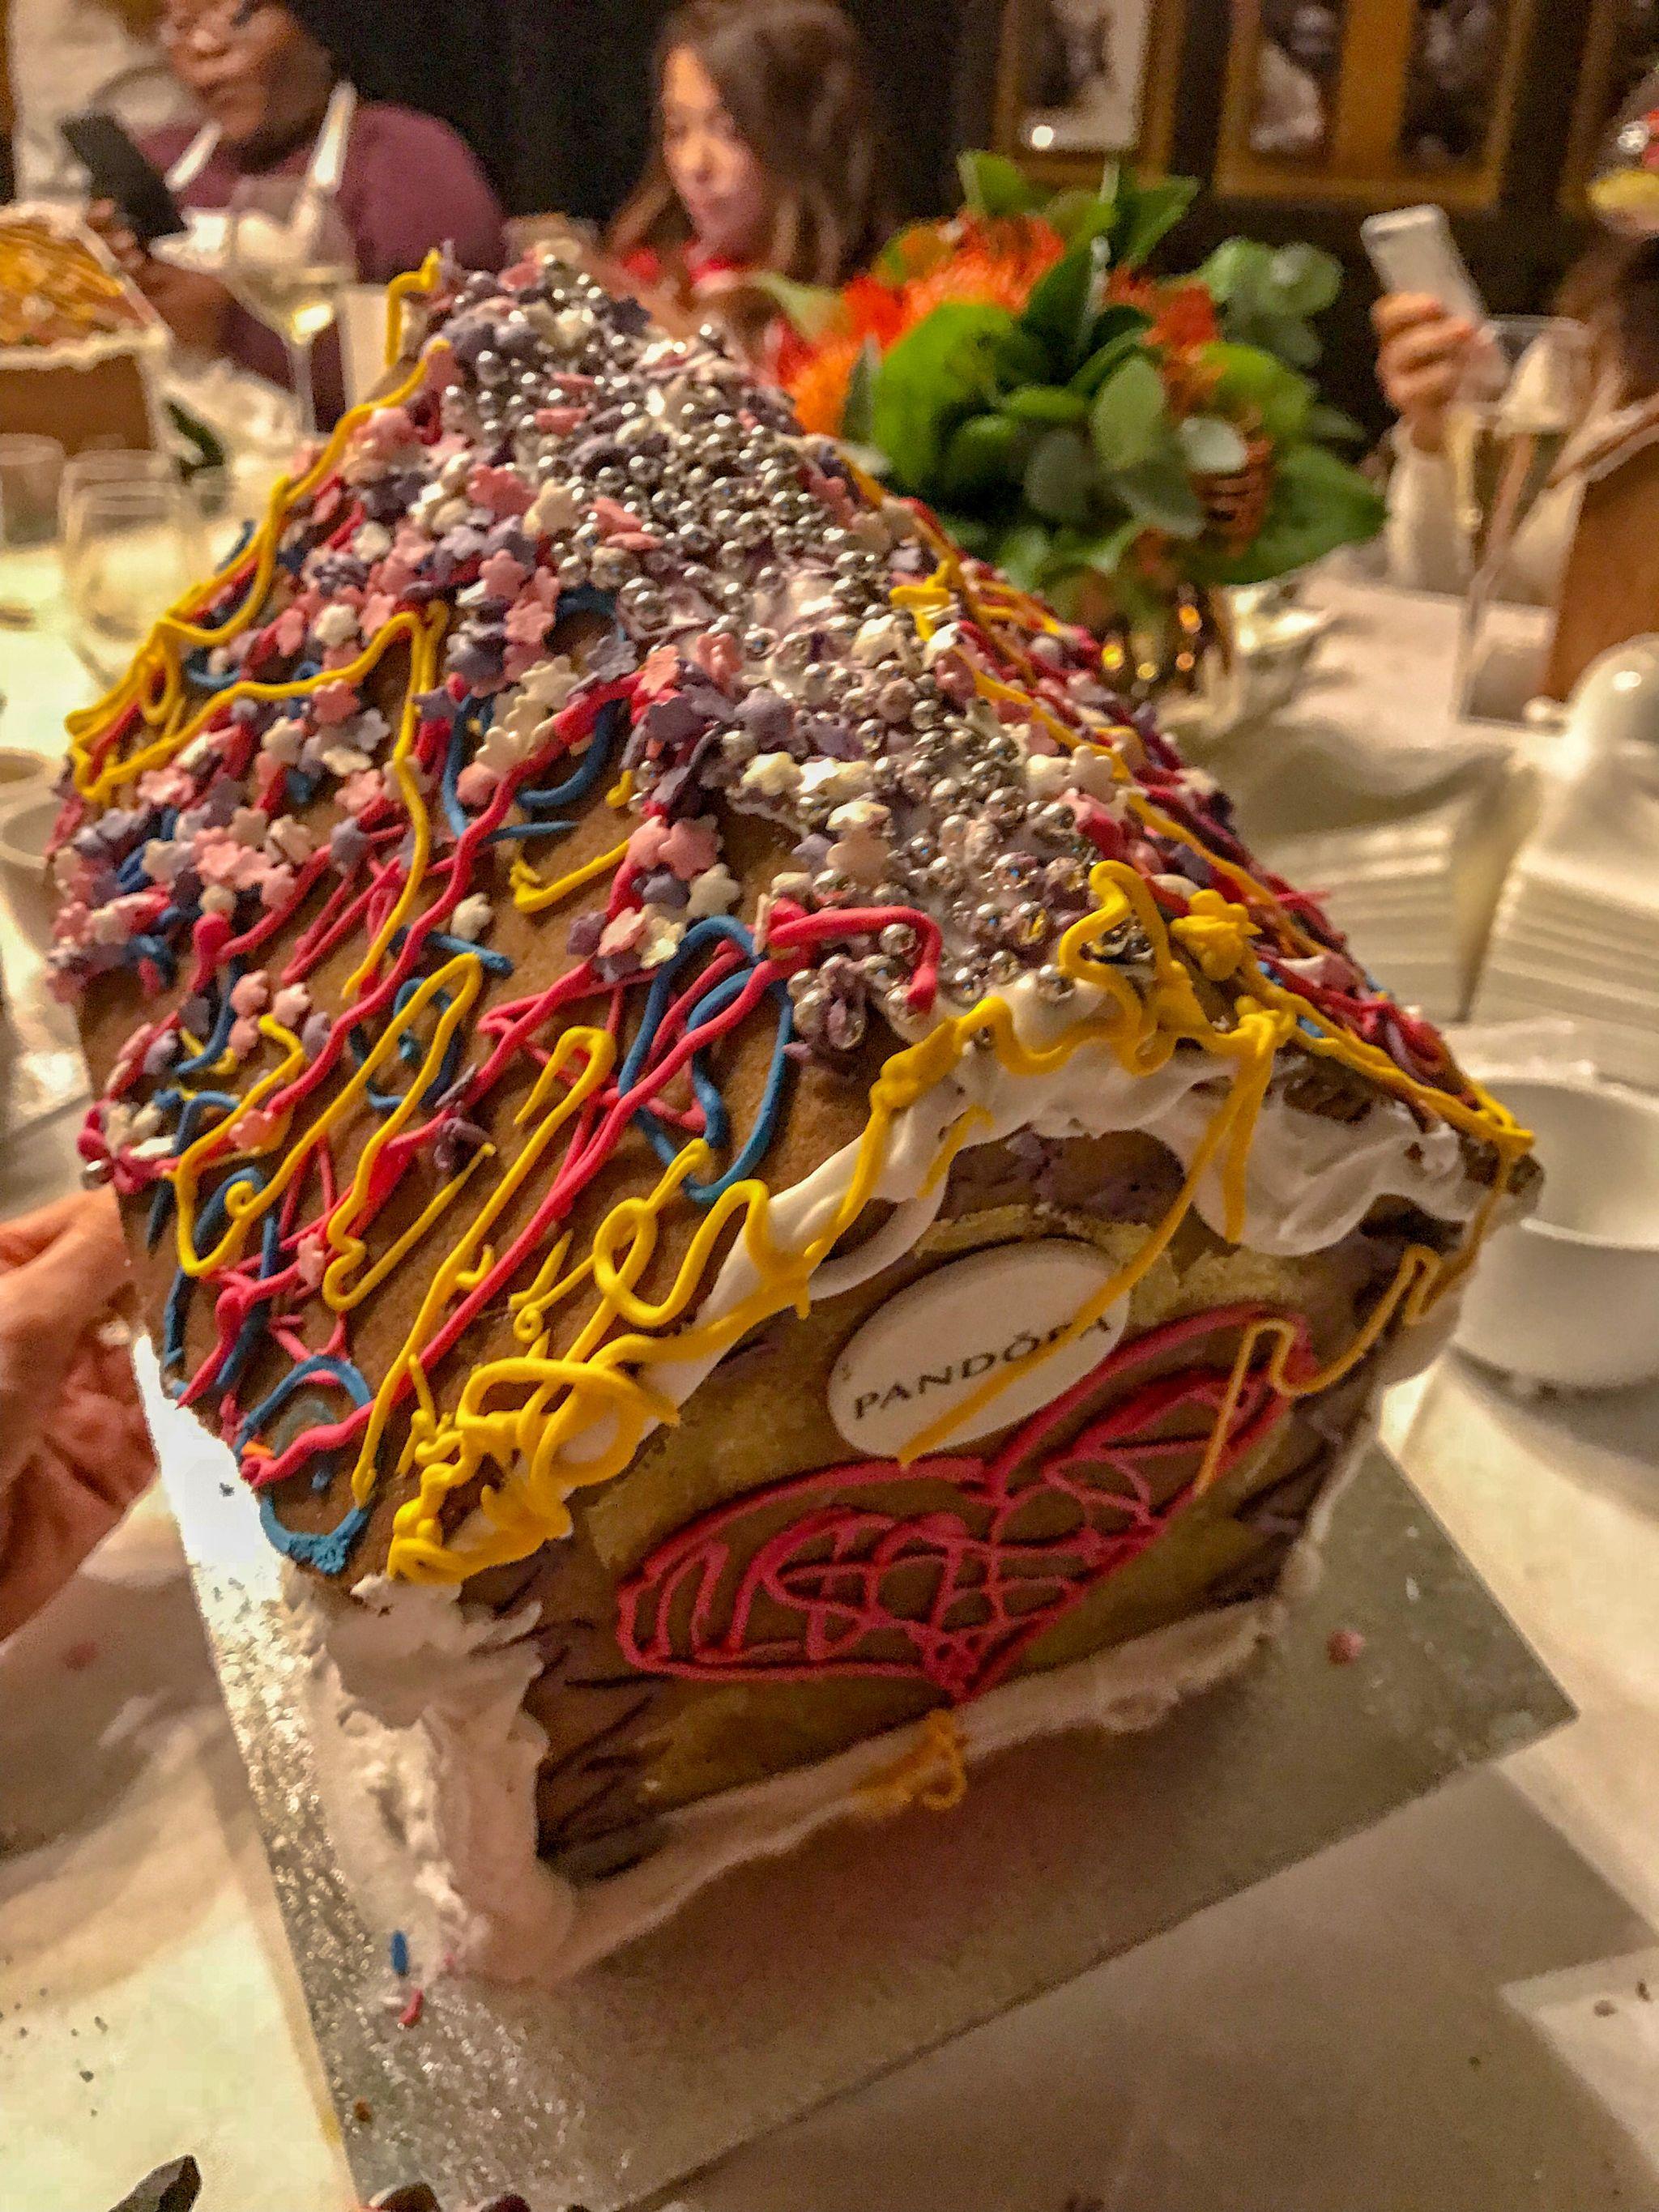 Laura Blair's colourful gingerbread house